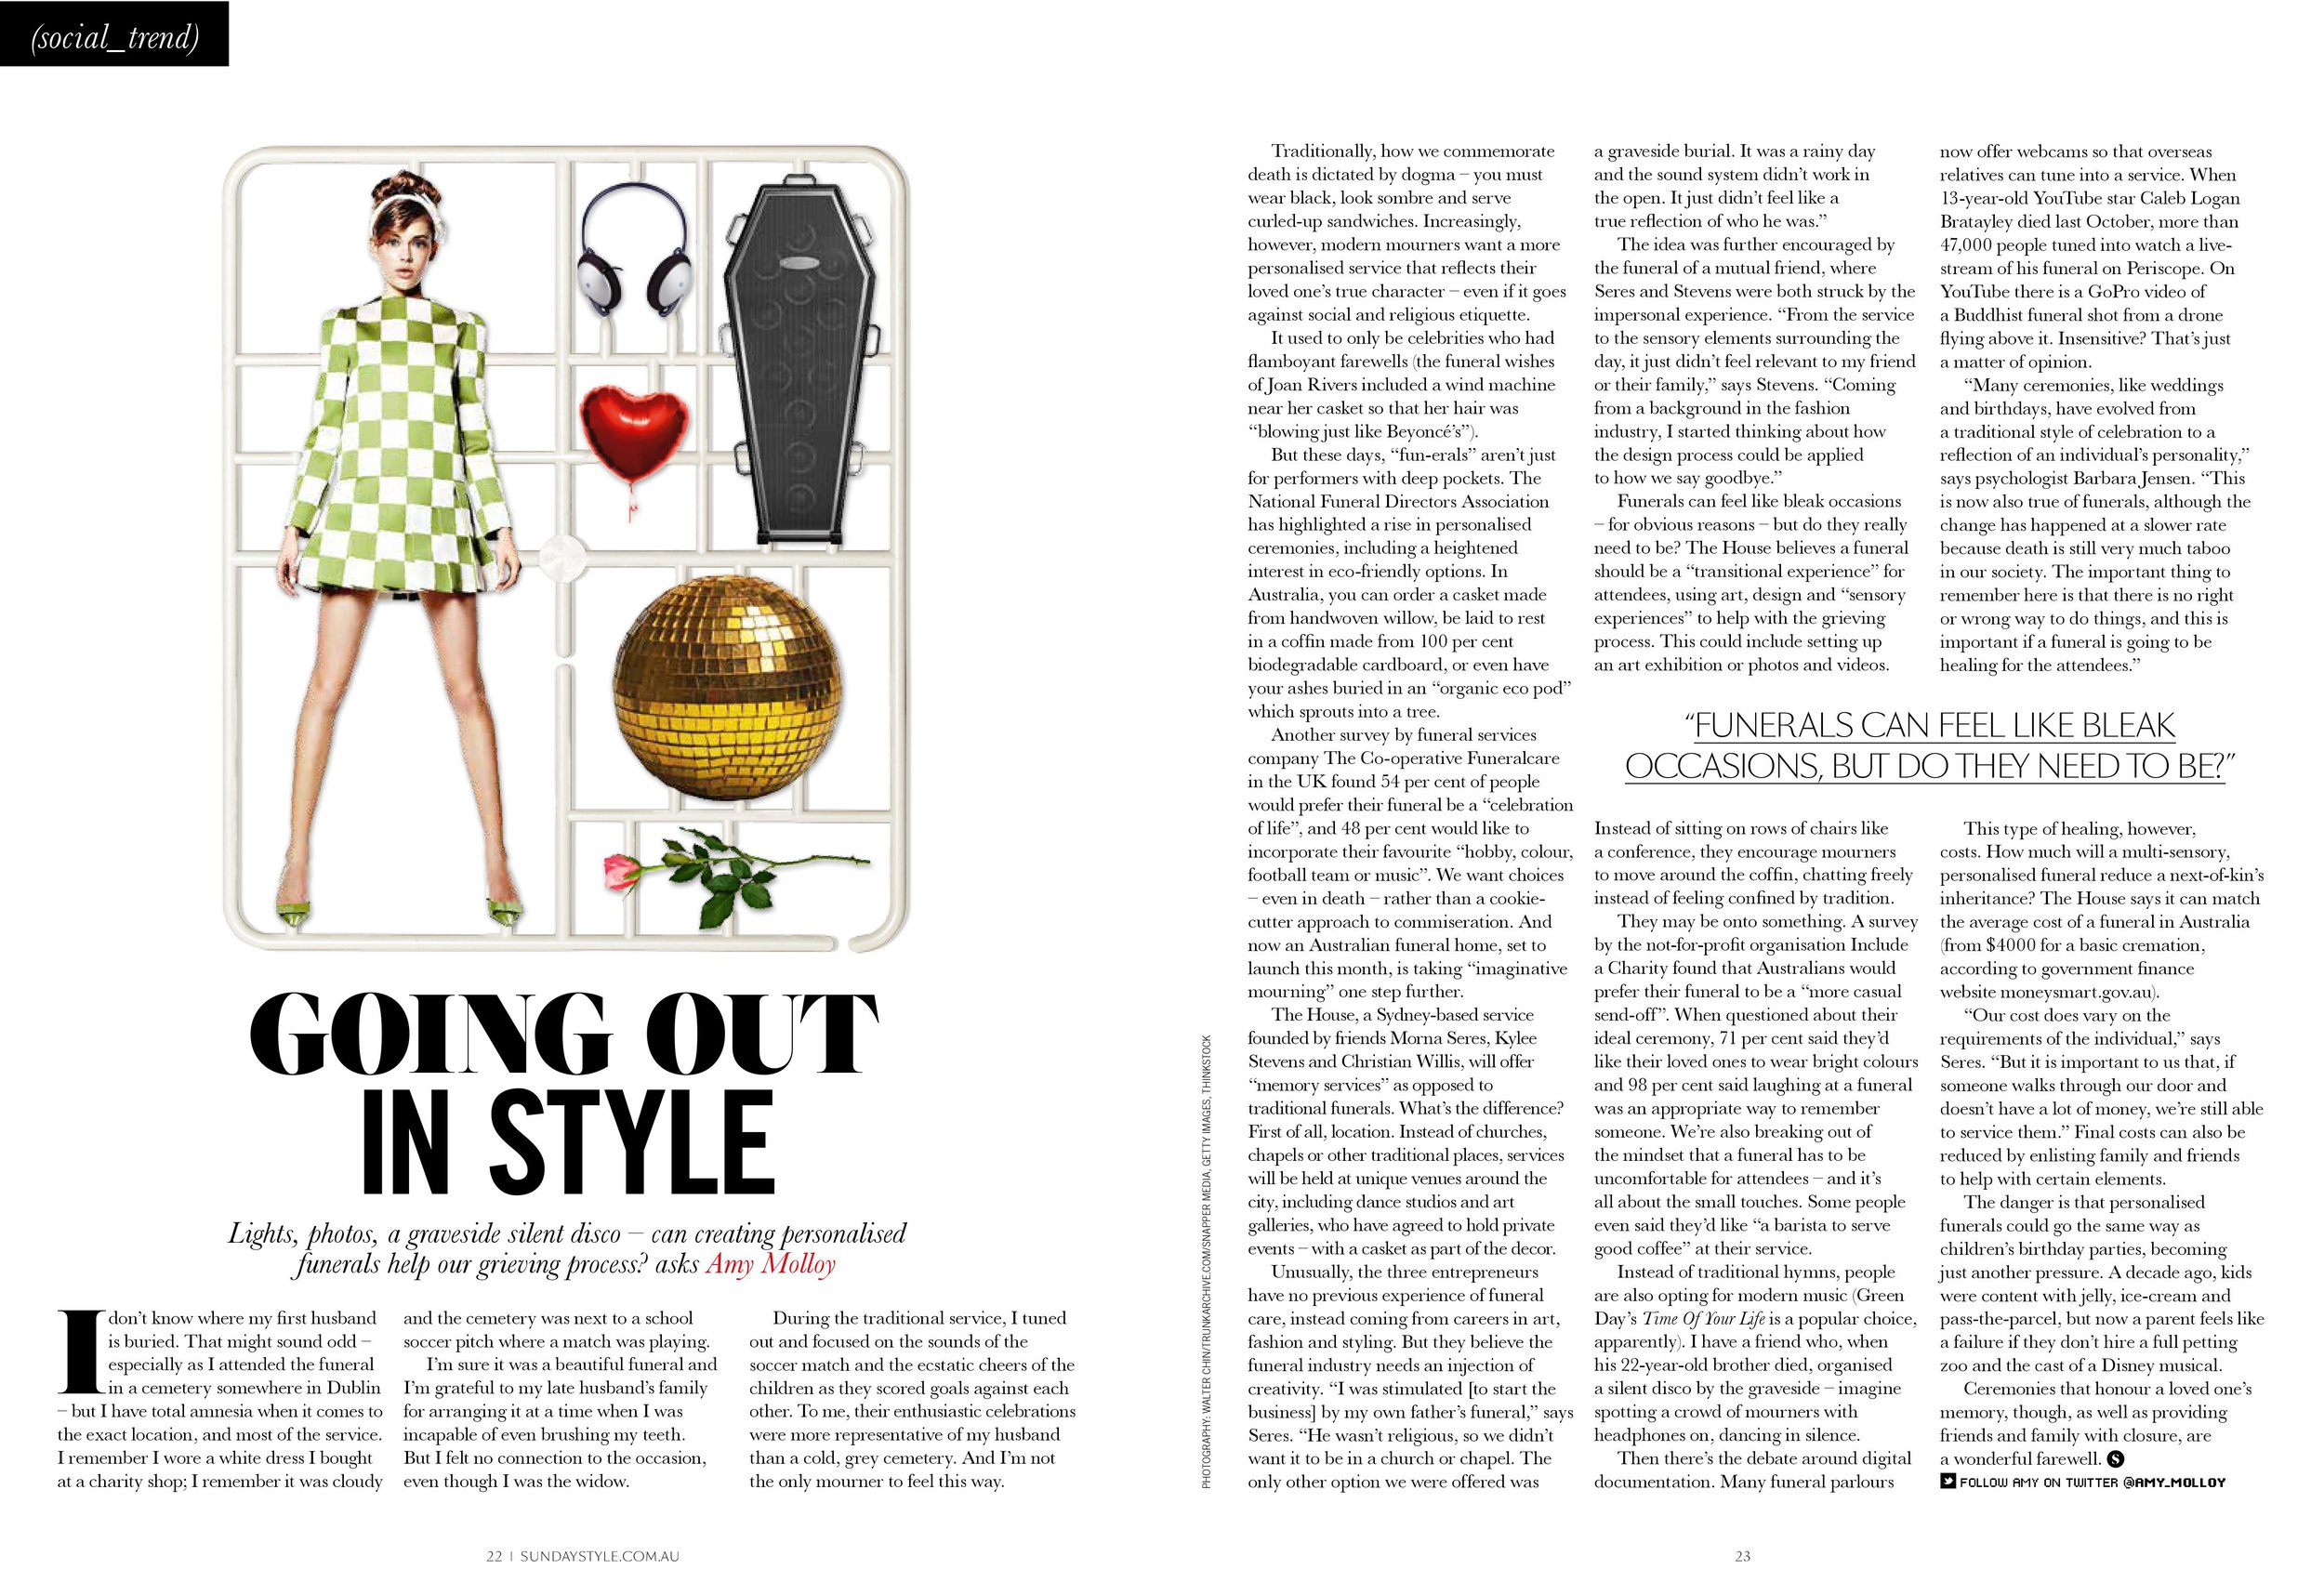 Sunday Style Article.jpg